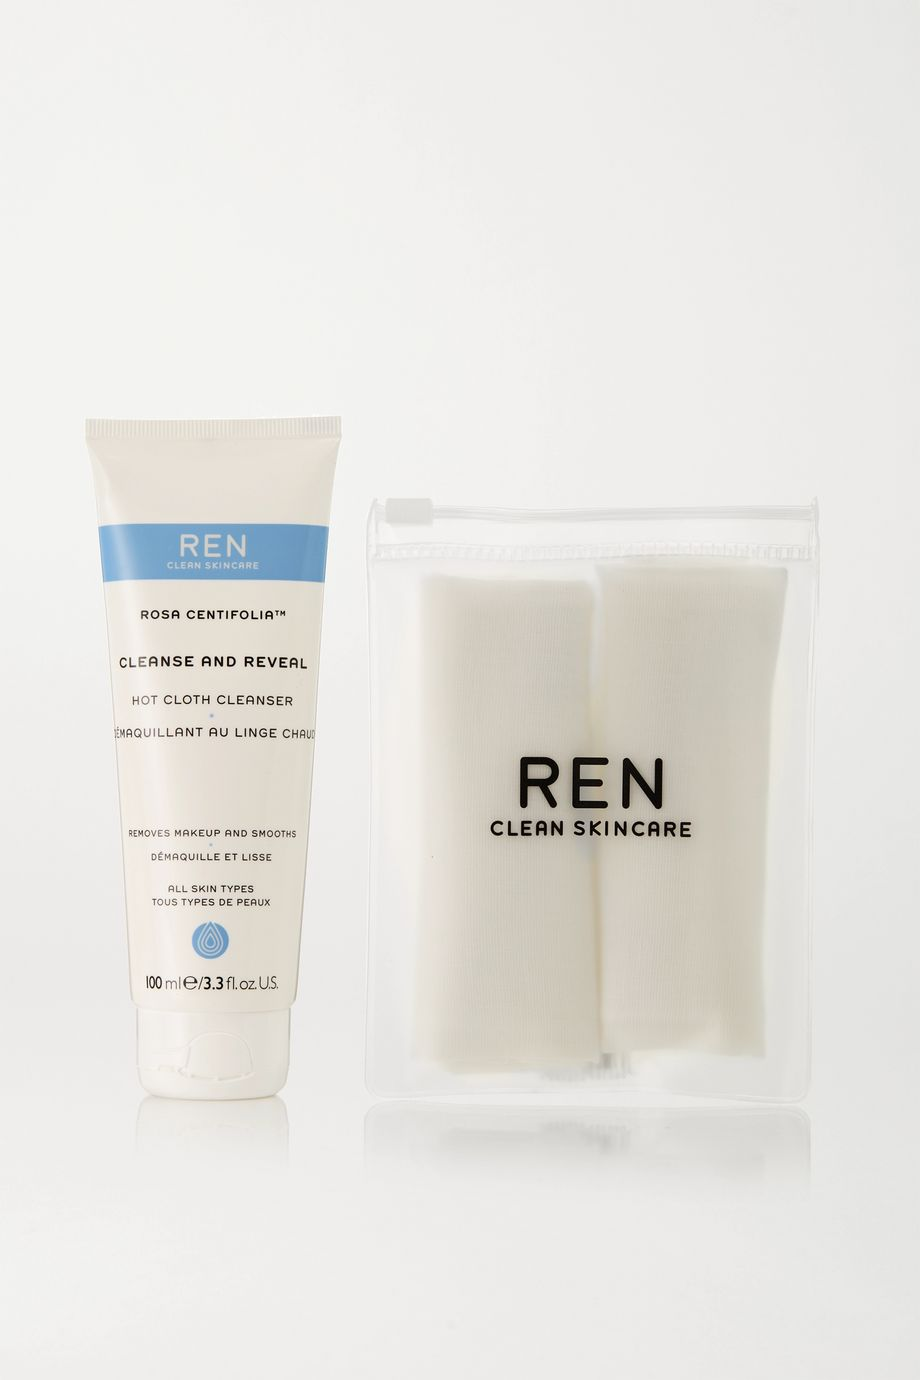 REN Clean Skincare Rosa Centifolia - Cleanse & Reveal Hot Cloth Cleanser Set, 100ml